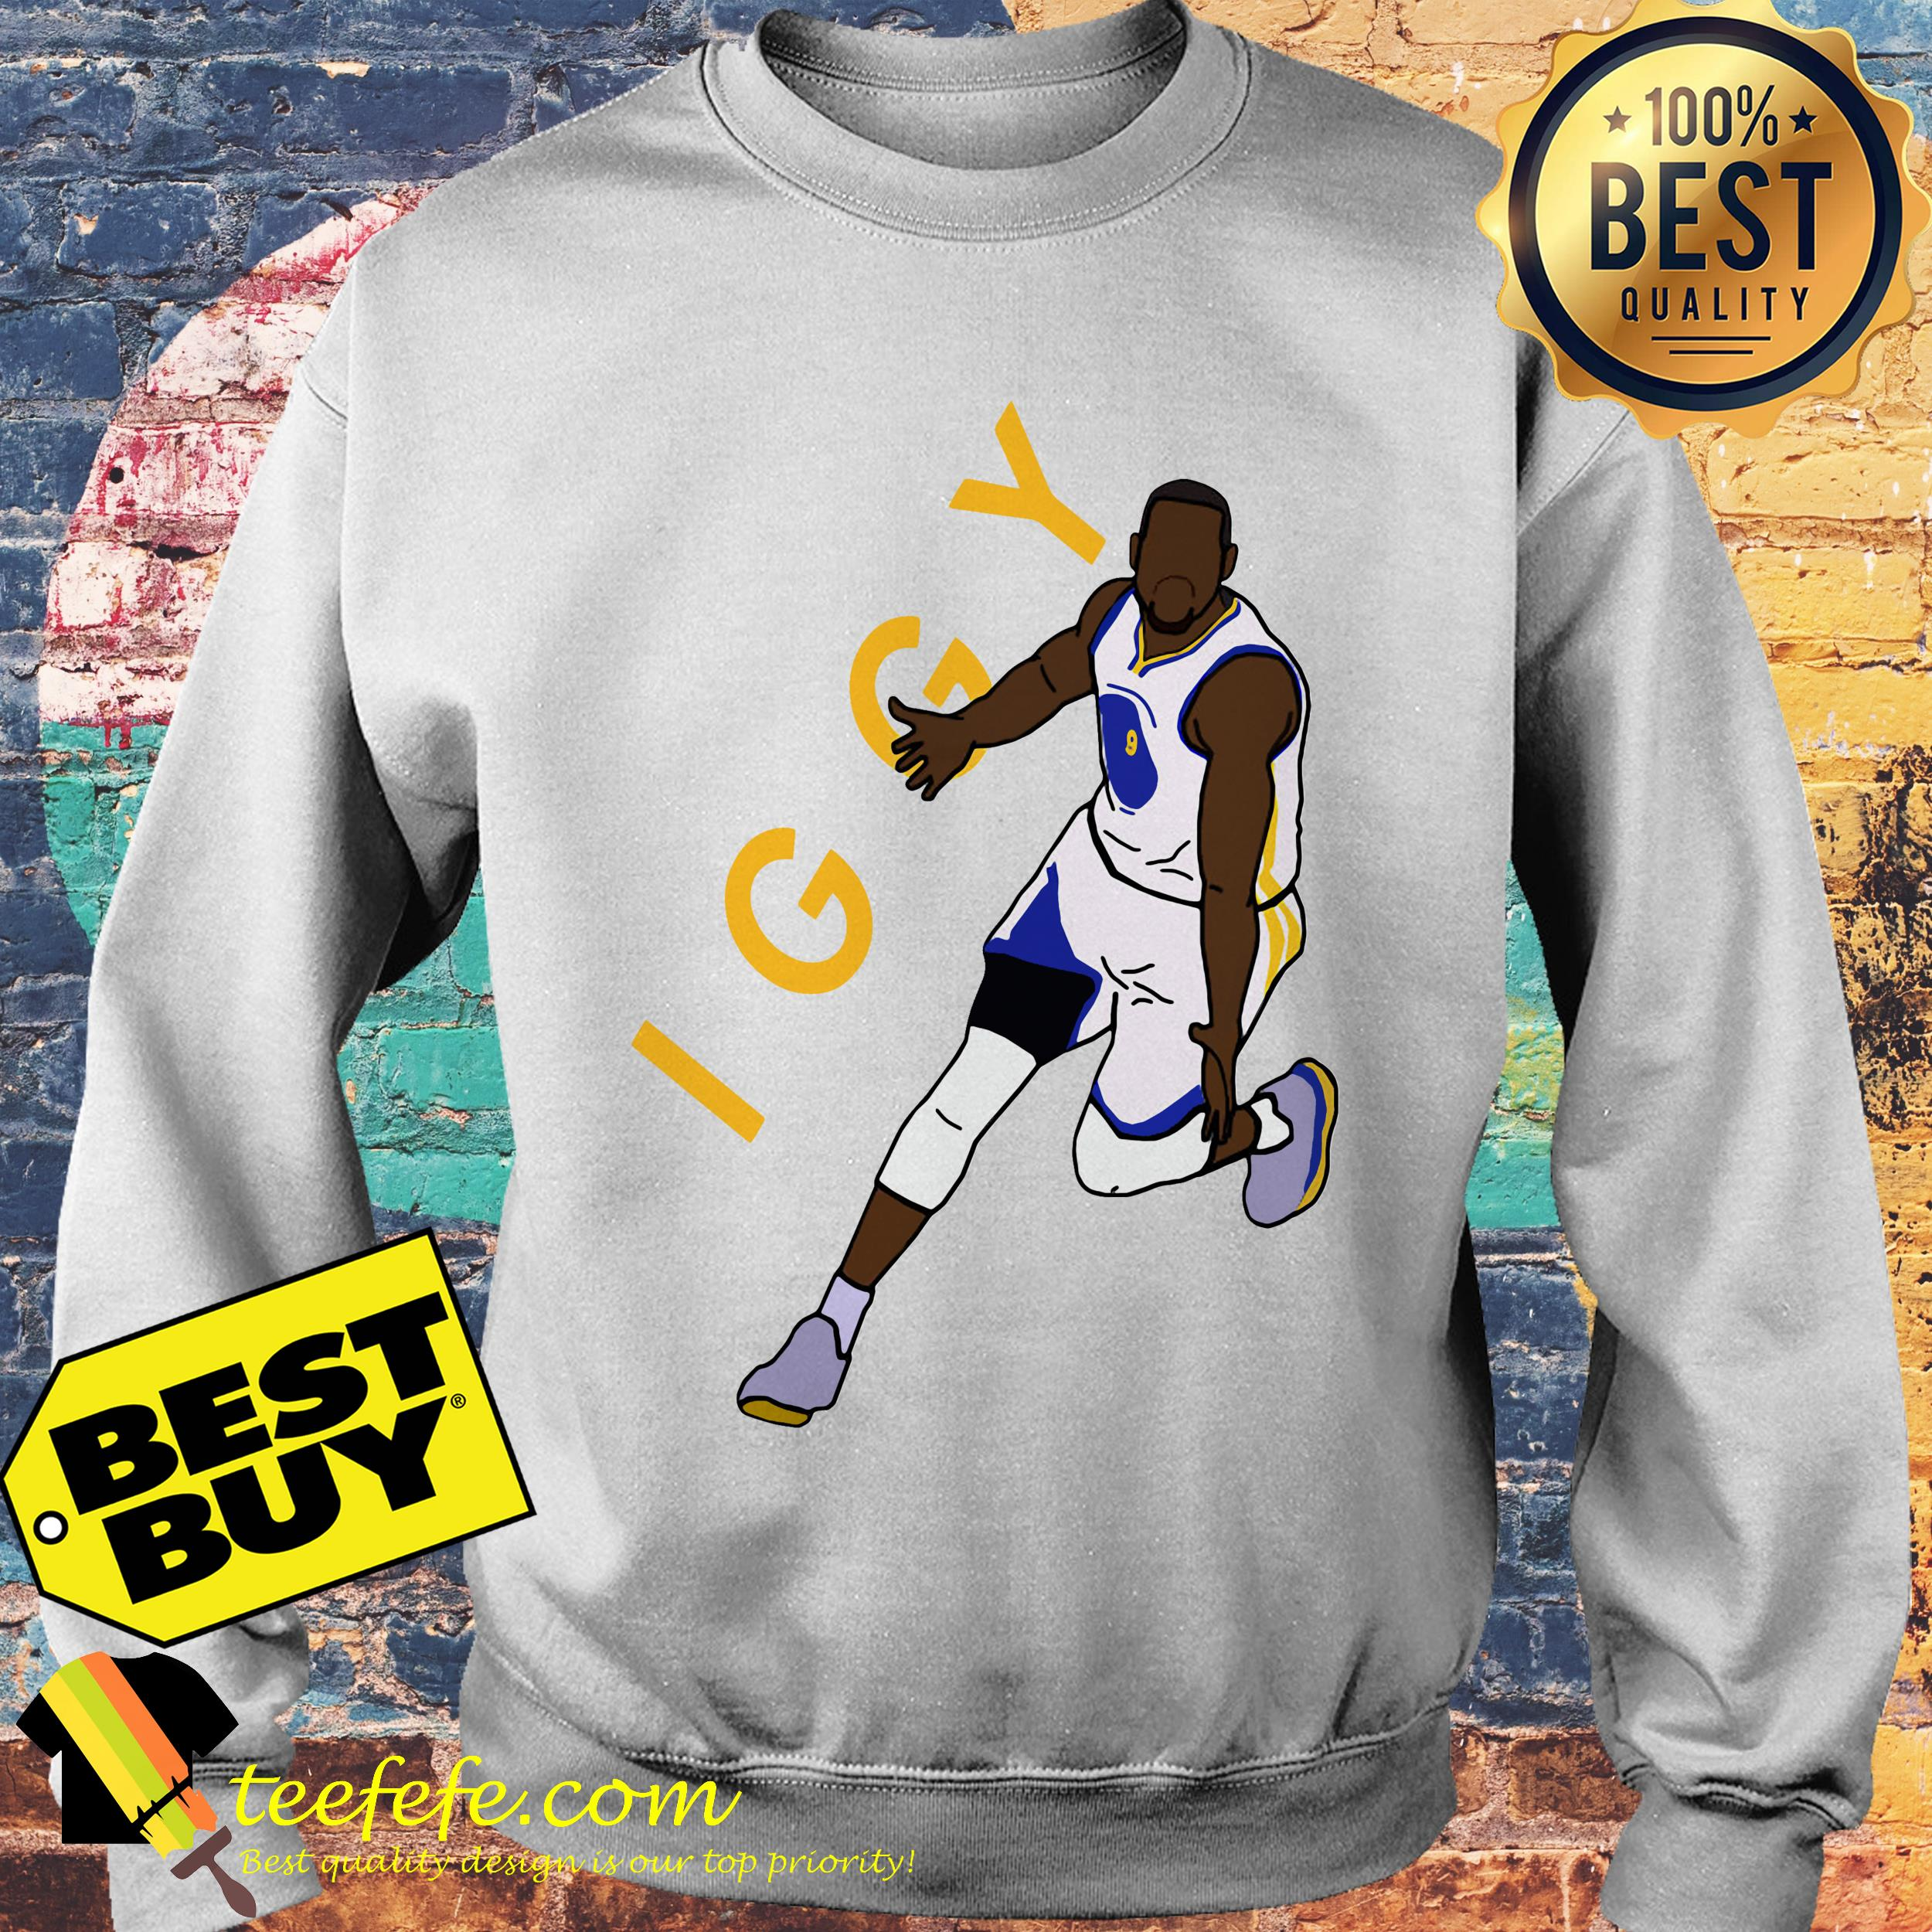 reputable site 42ffb 9c8e8 Andre Iguodala 'IGGY' – NBA golden state warriors kids shirt